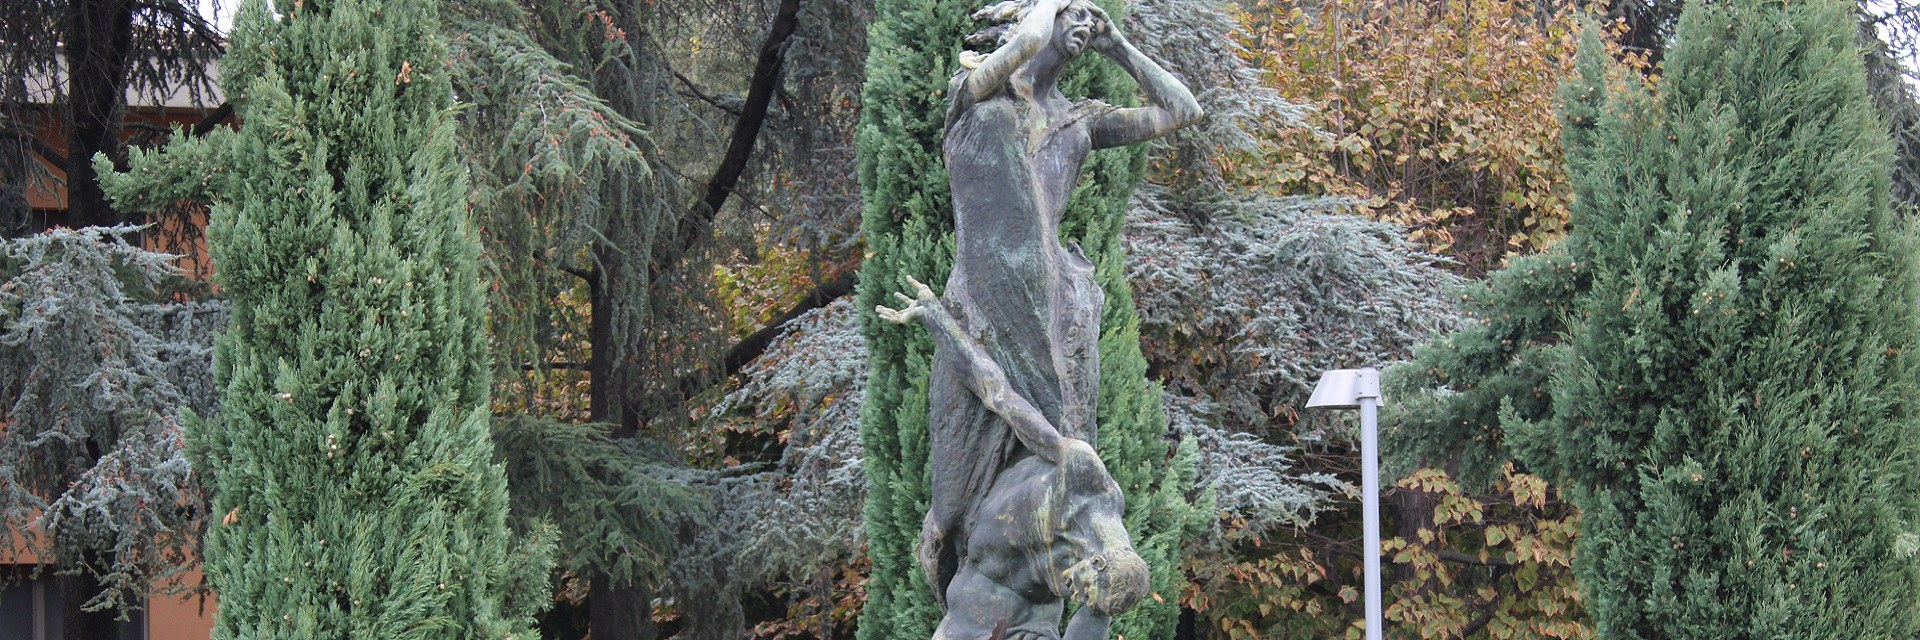 Statua di Marino Quartieri